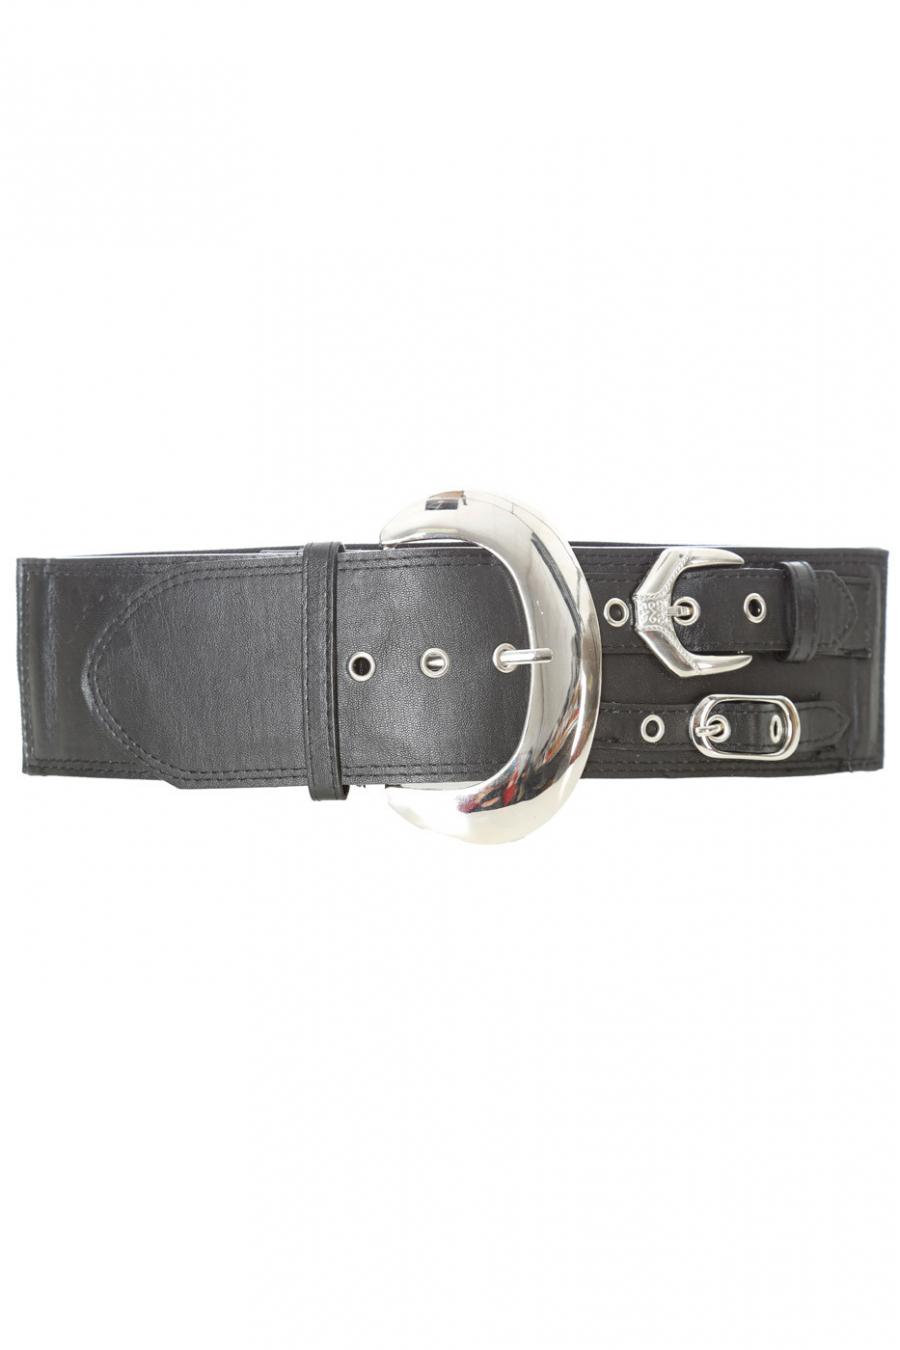 Elastic black belt, large rounded buckle. SG-0306